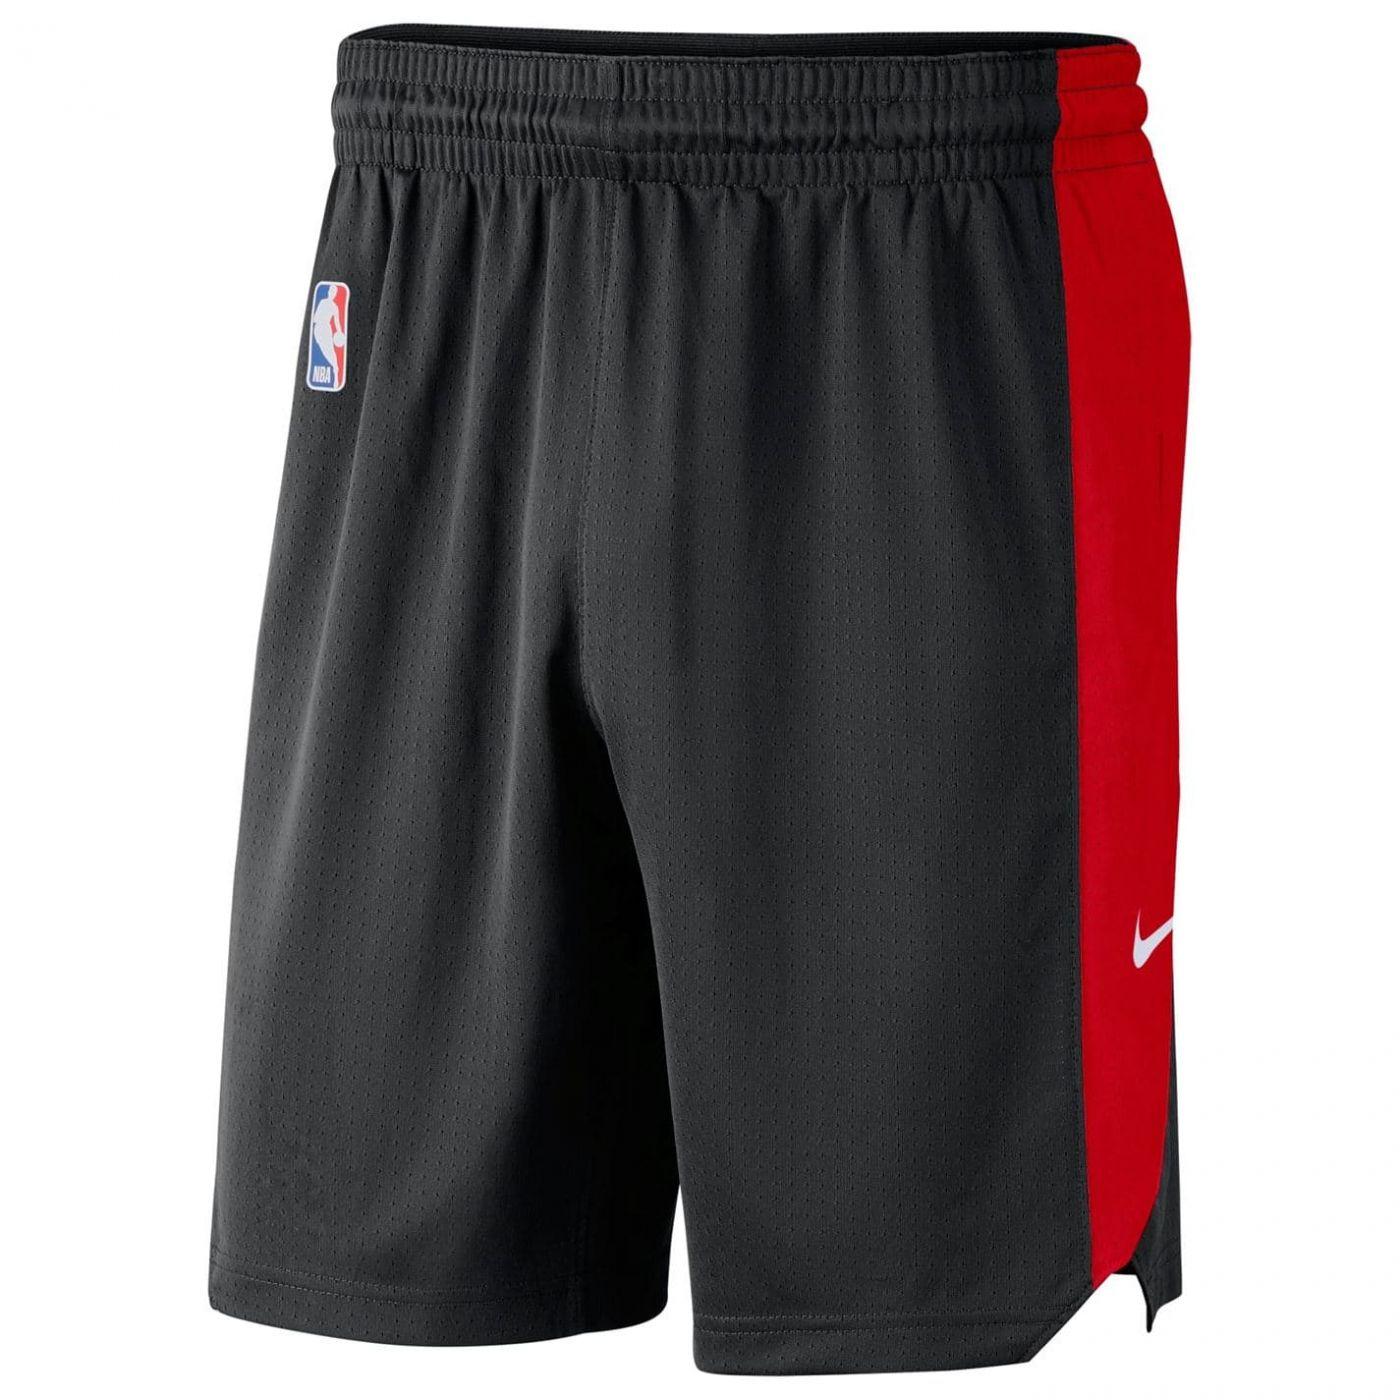 Nike Raptors Shorts Mens